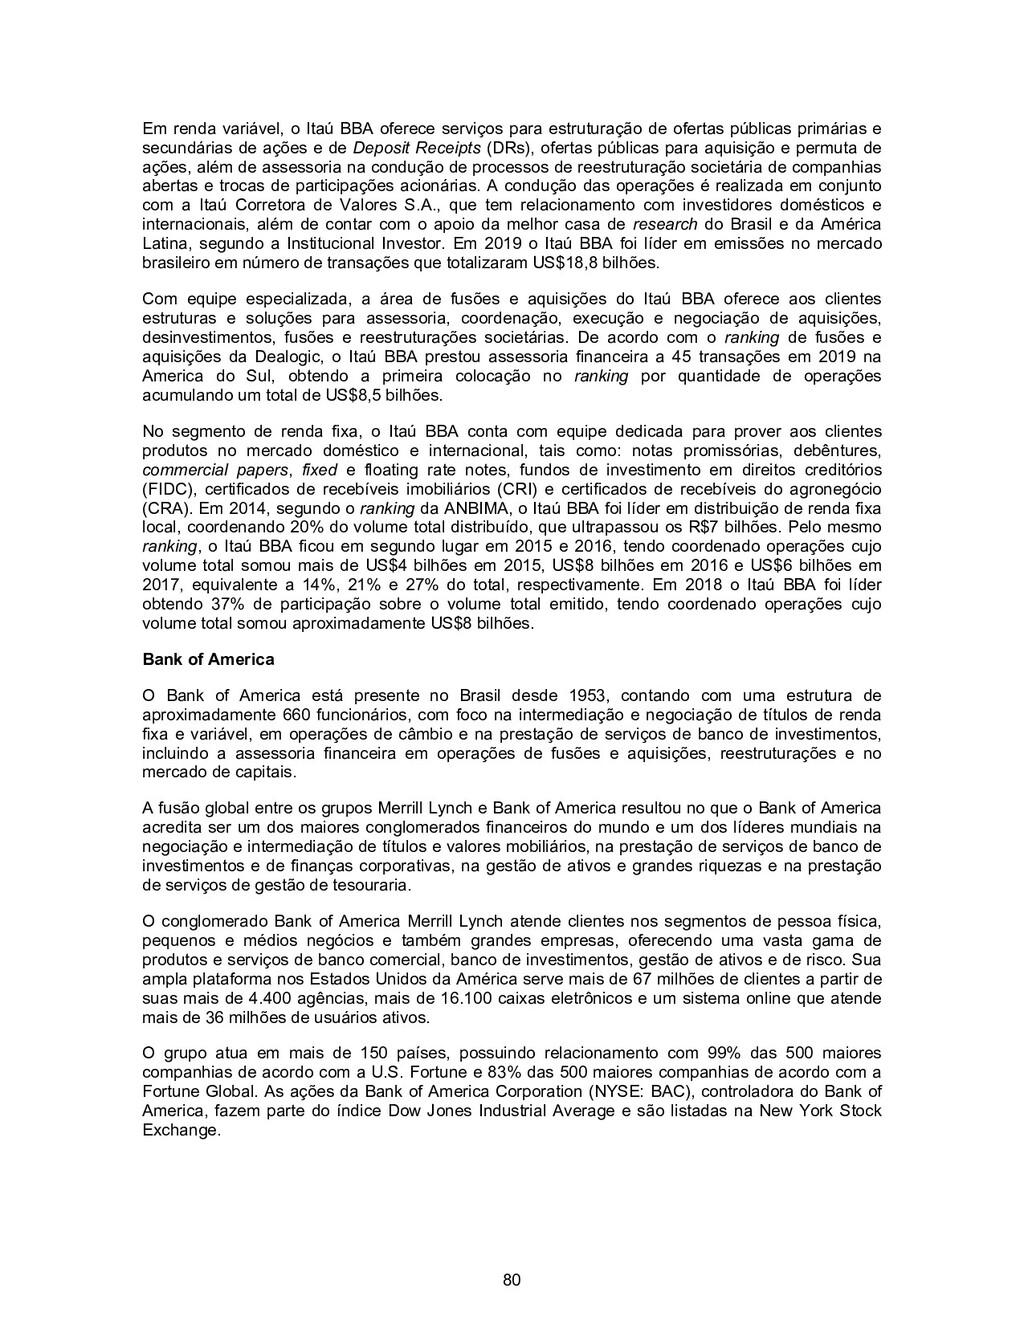 80 Em renda variável, o Itaú BBA oferece serviç...